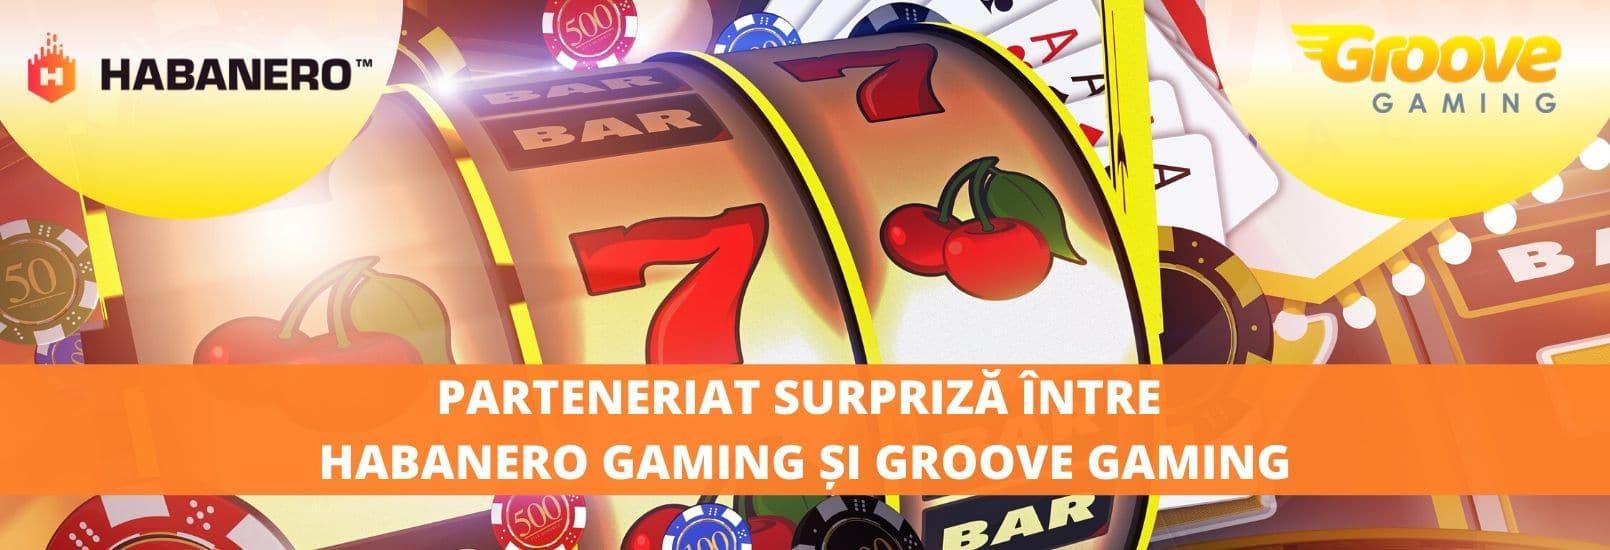 habanero gaming groove gaming banner